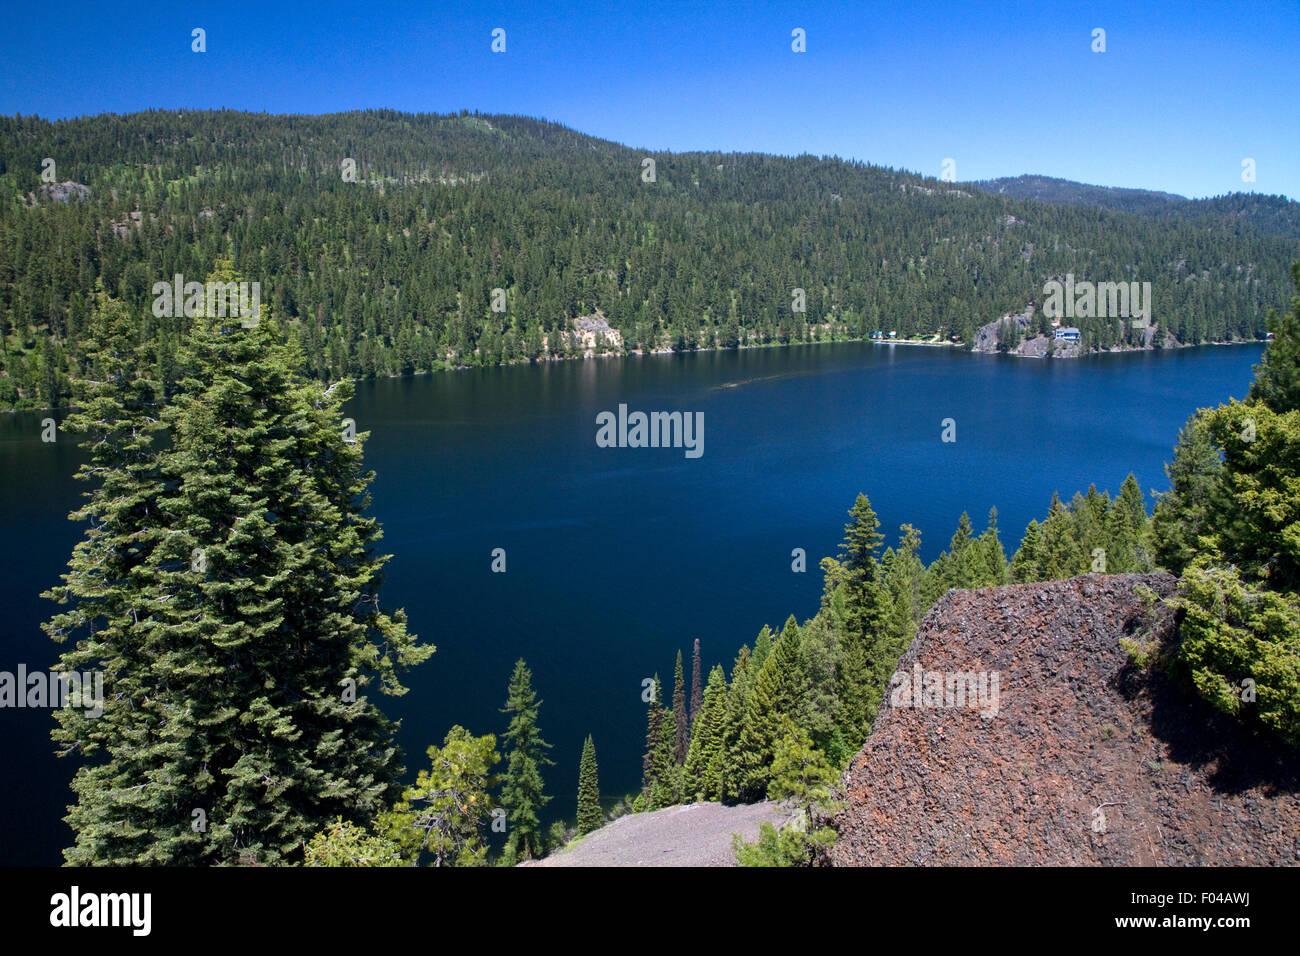 Payette Lake in McCall, Idaho, USA. - Stock Image